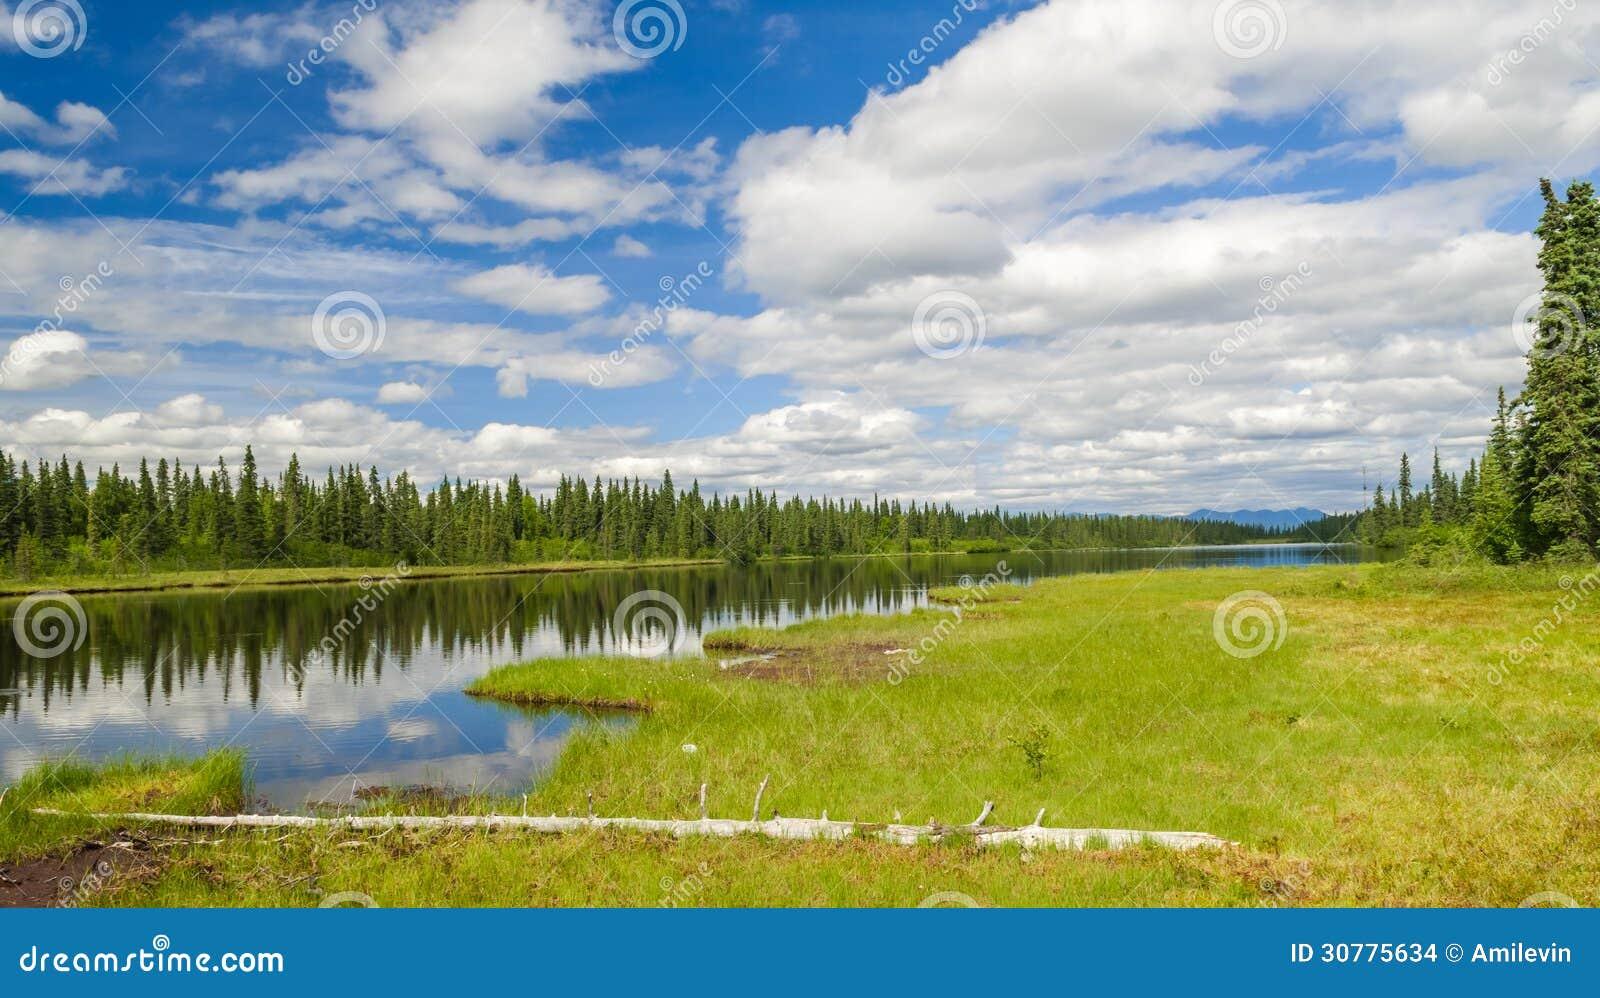 trees summer alaska - photo #28